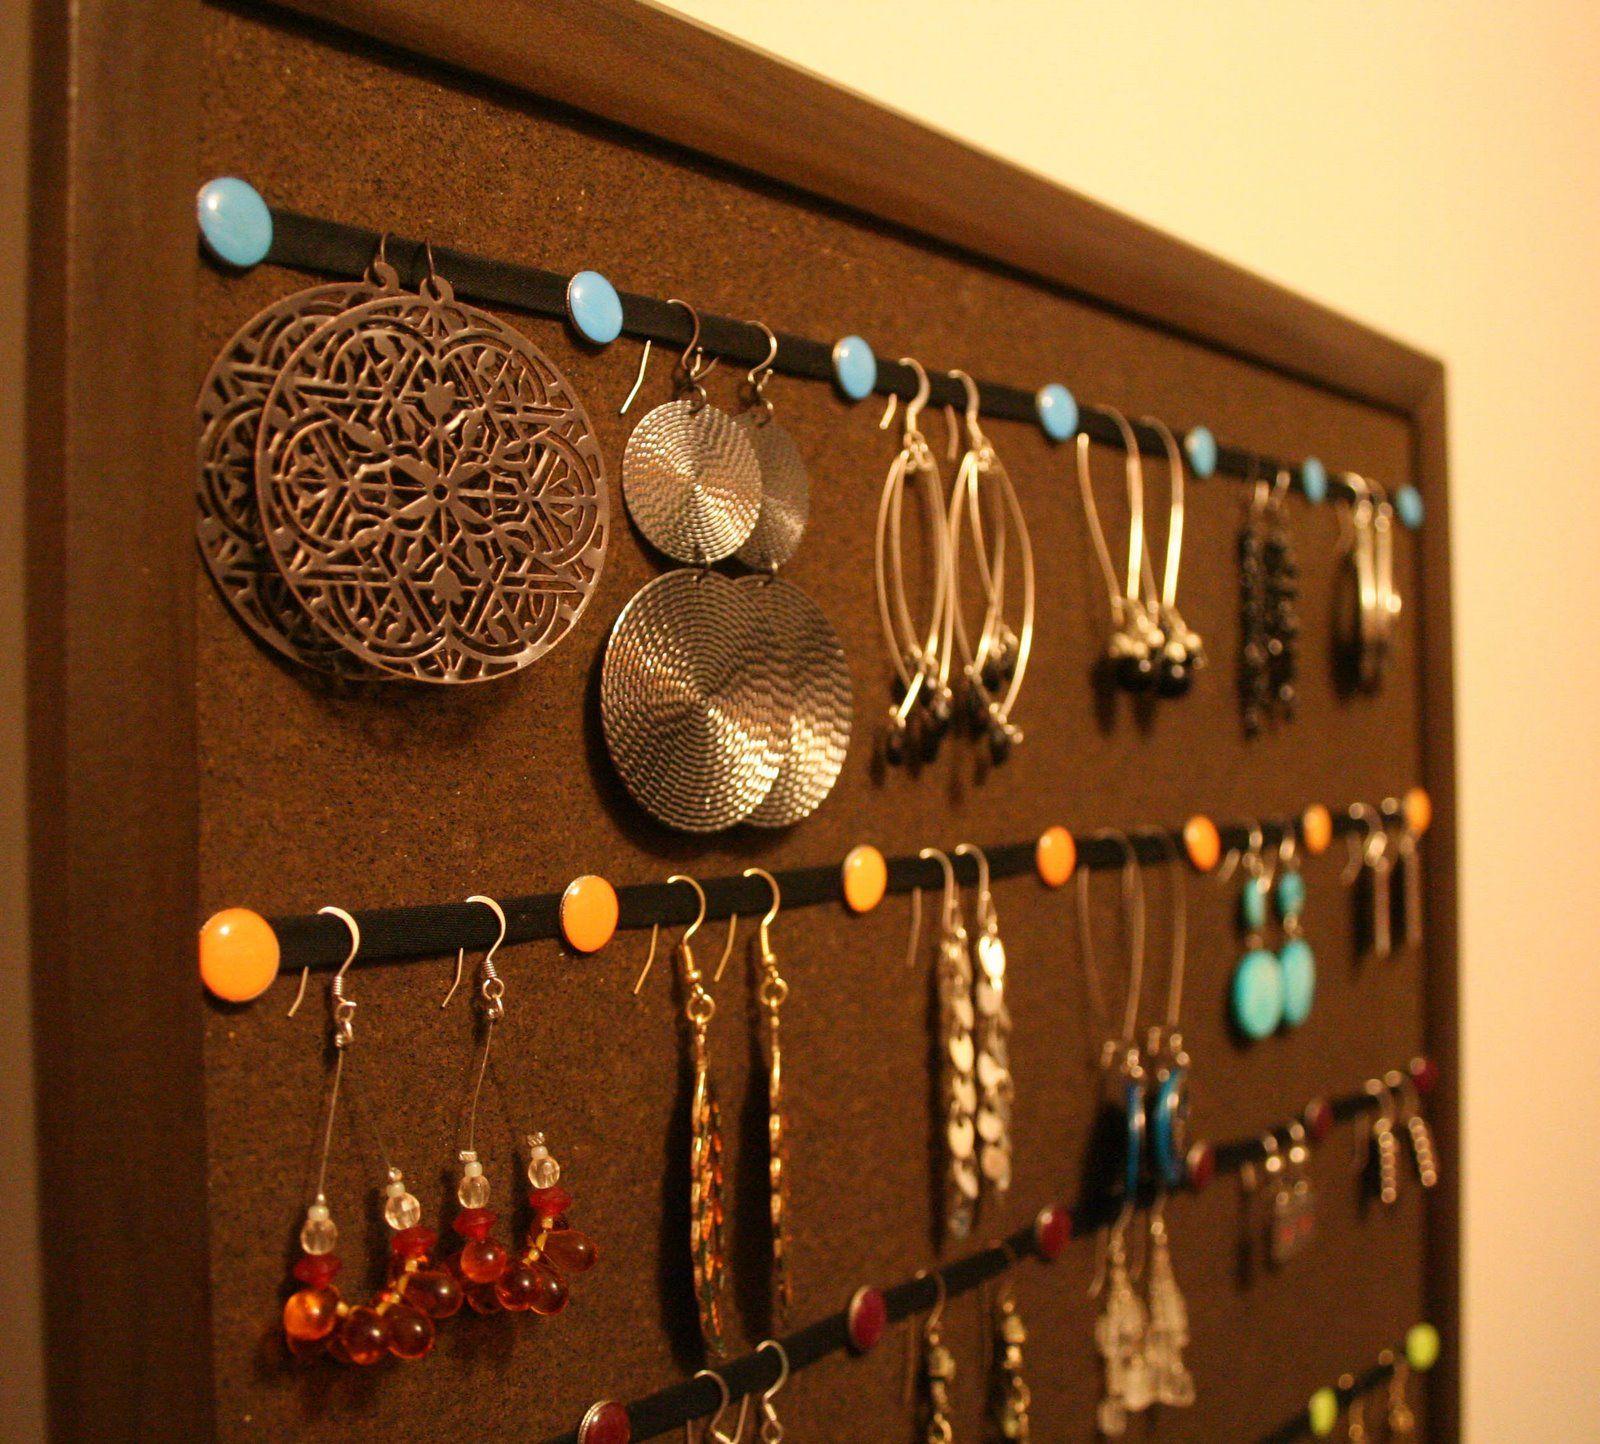 jewelry+project1.jpg (image)